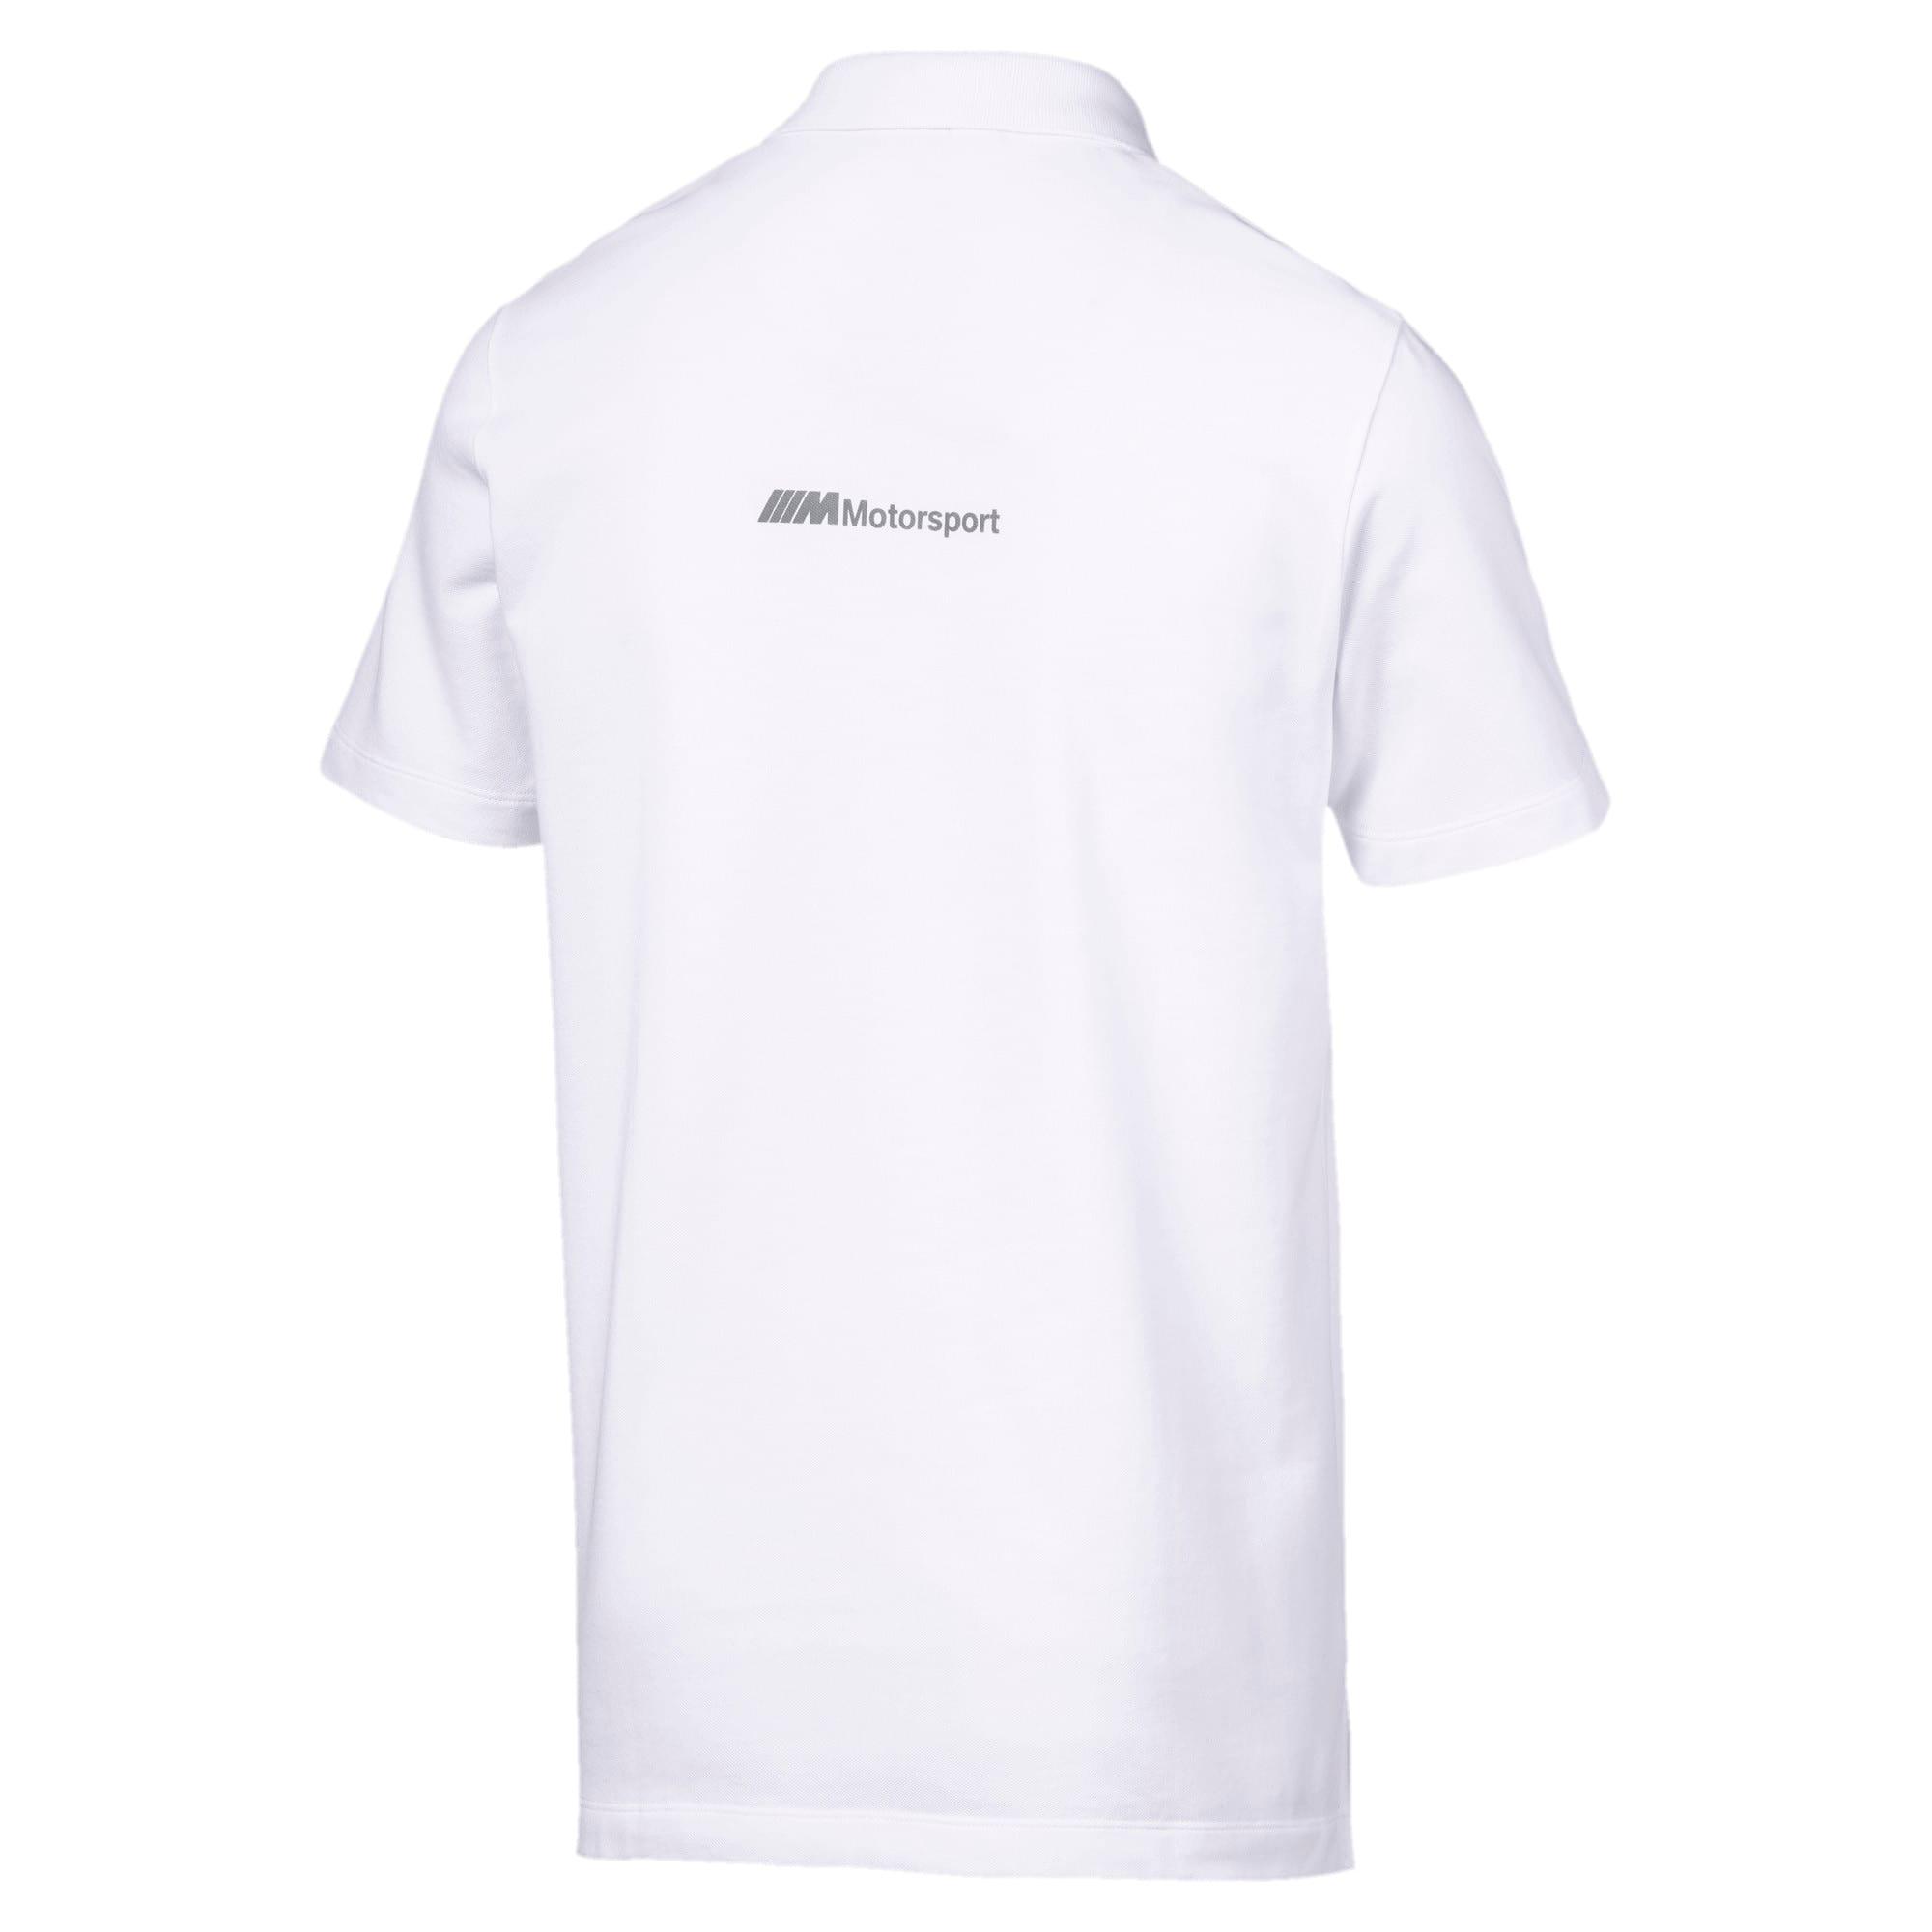 Thumbnail 5 of BMW M Motorsport Life Graphic Men's Polo Shirt, Puma White, medium